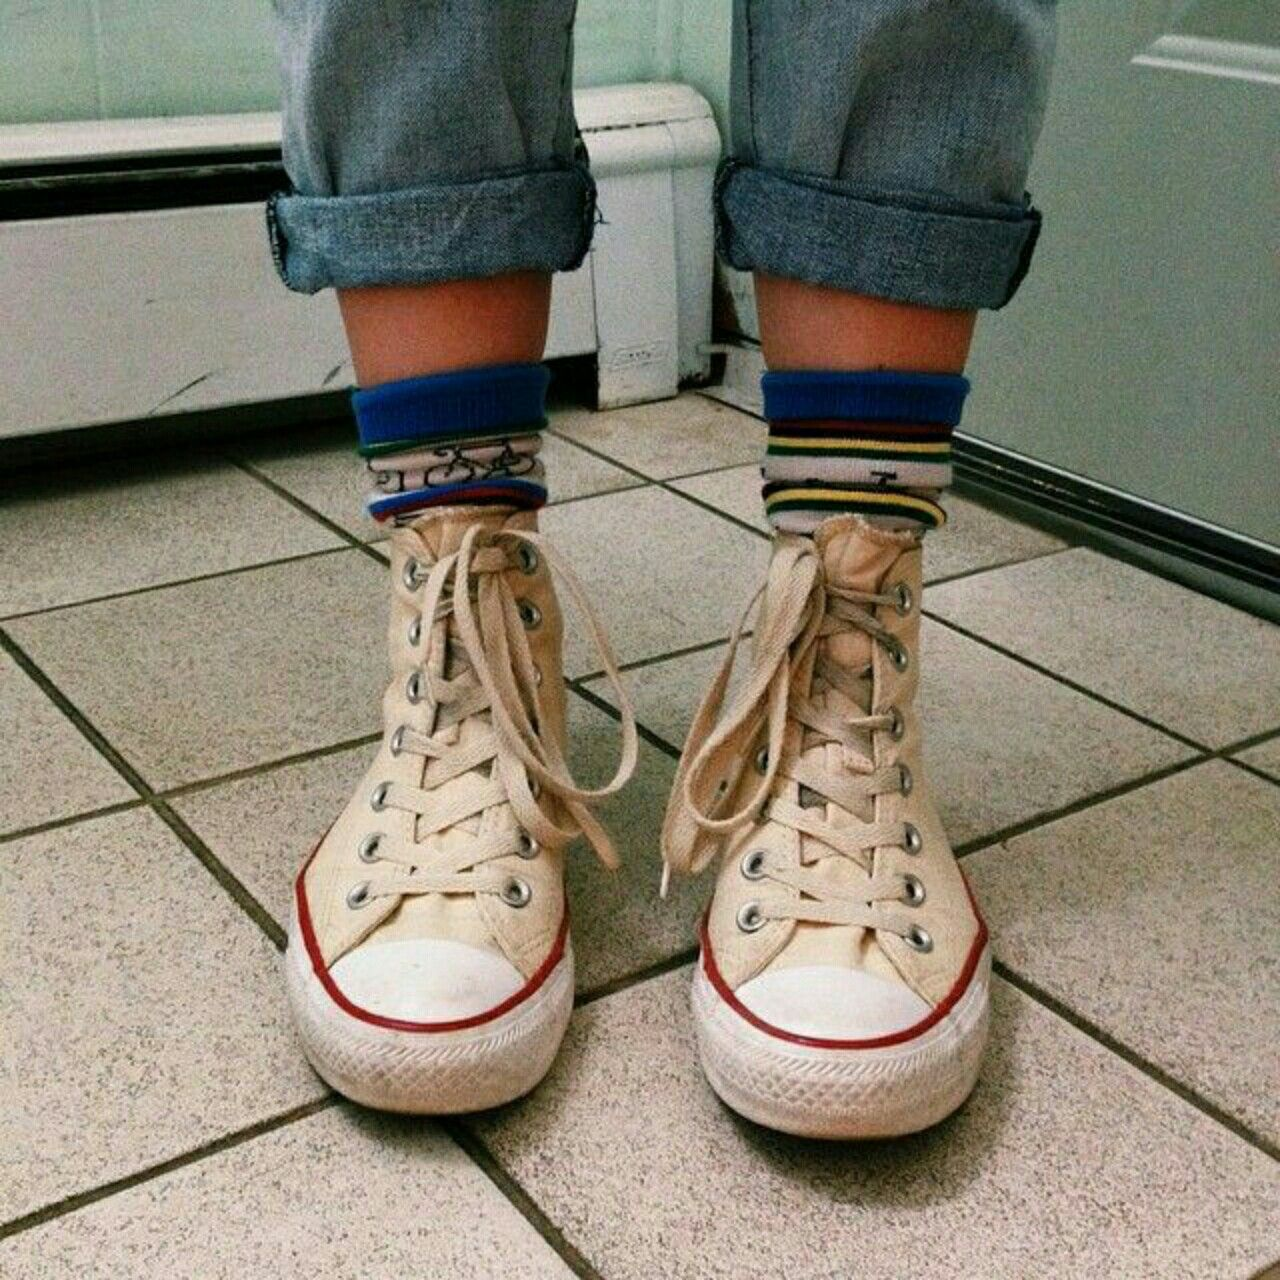 90s fashion converse